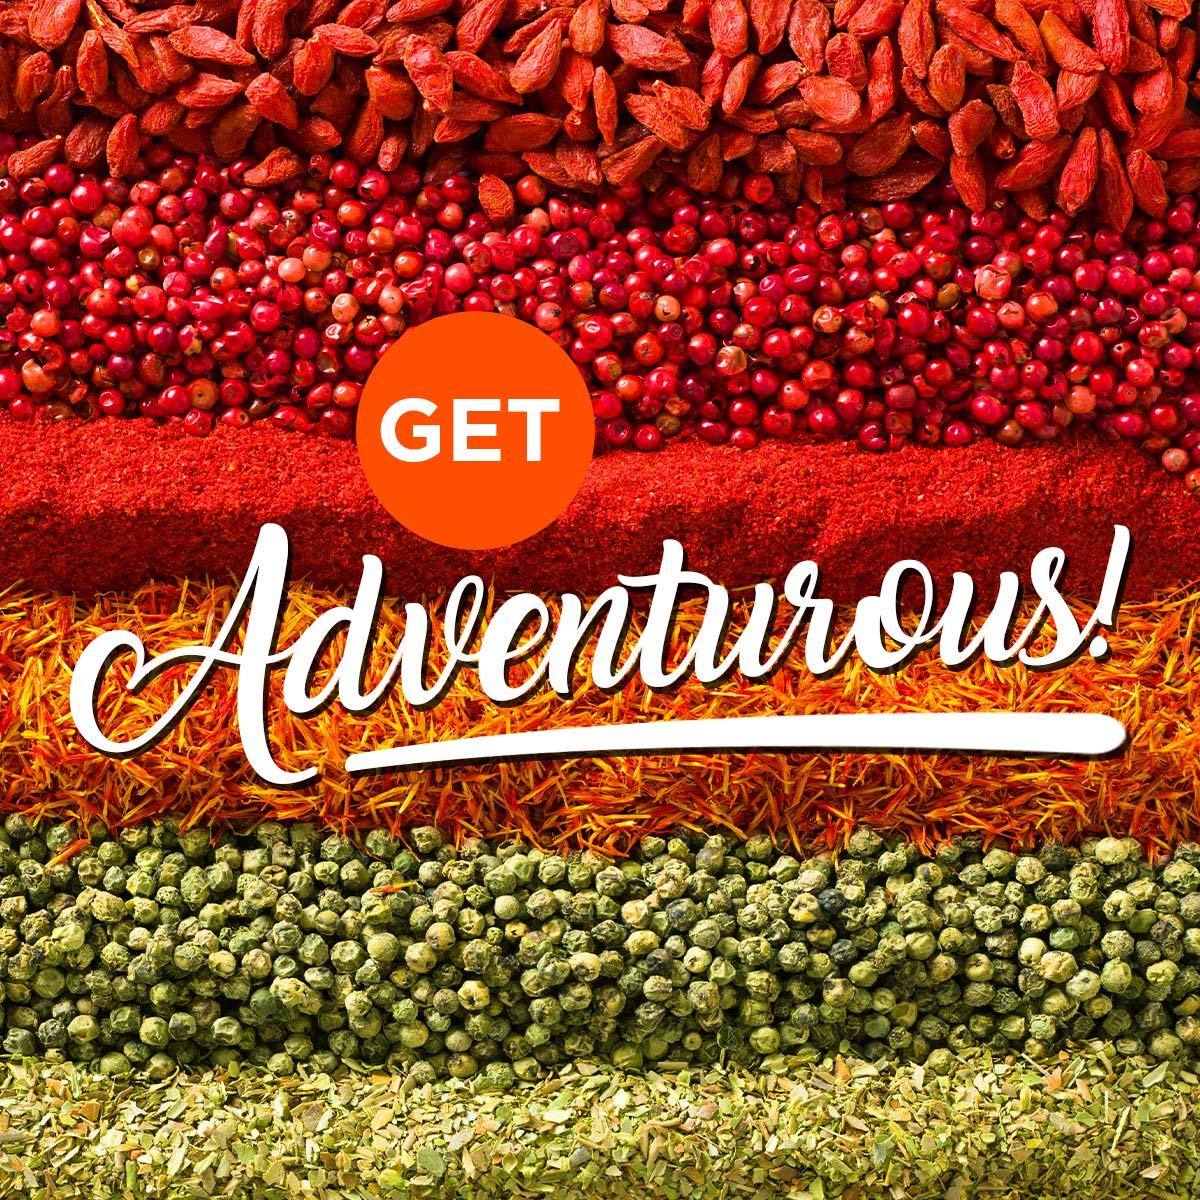 Get Adventurous!